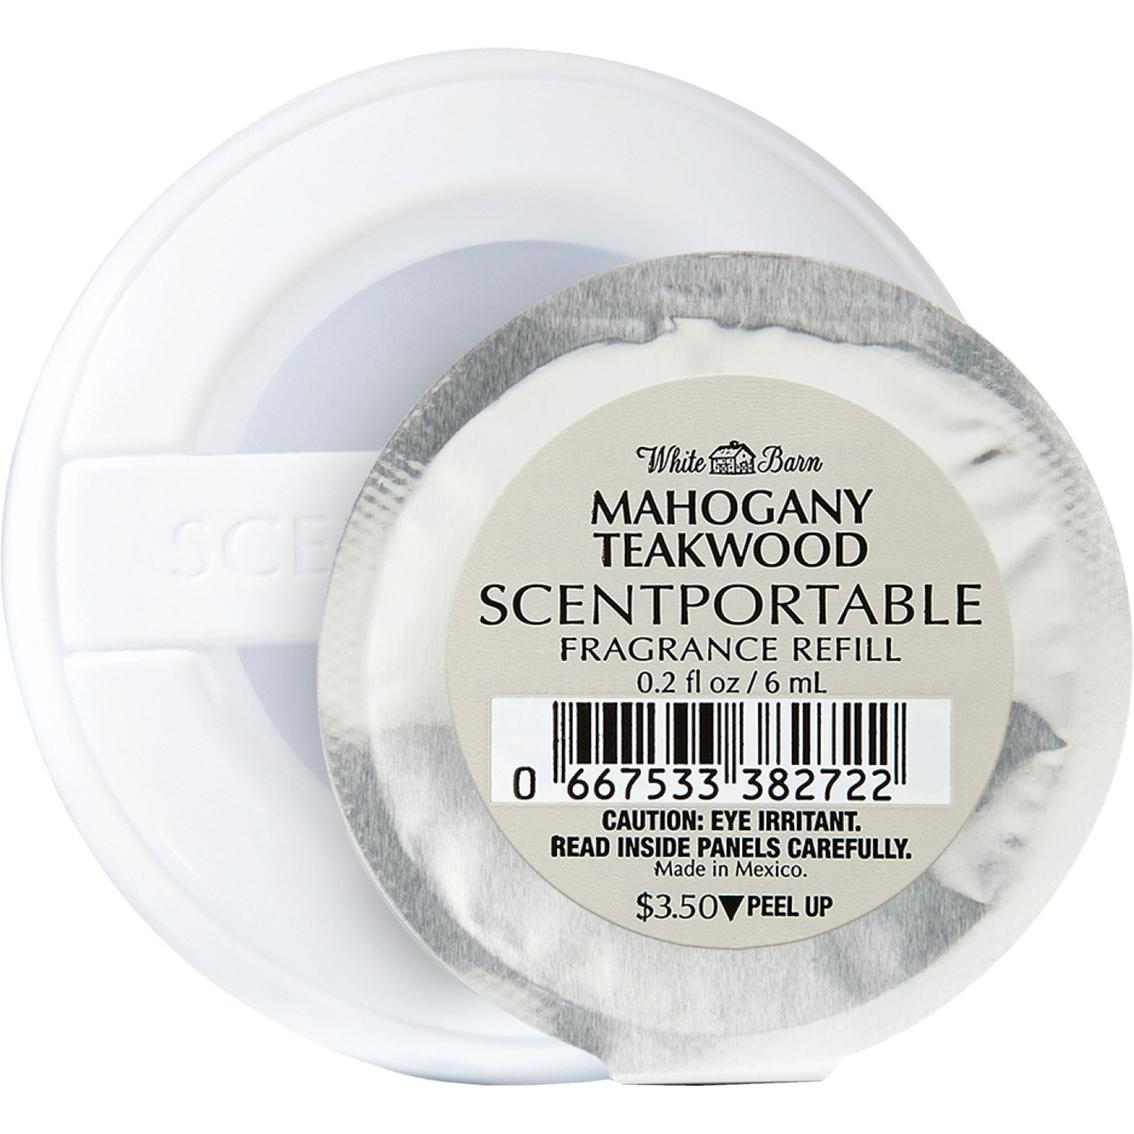 Bath Body Works Mahogany Teakwood Scentportable Refill